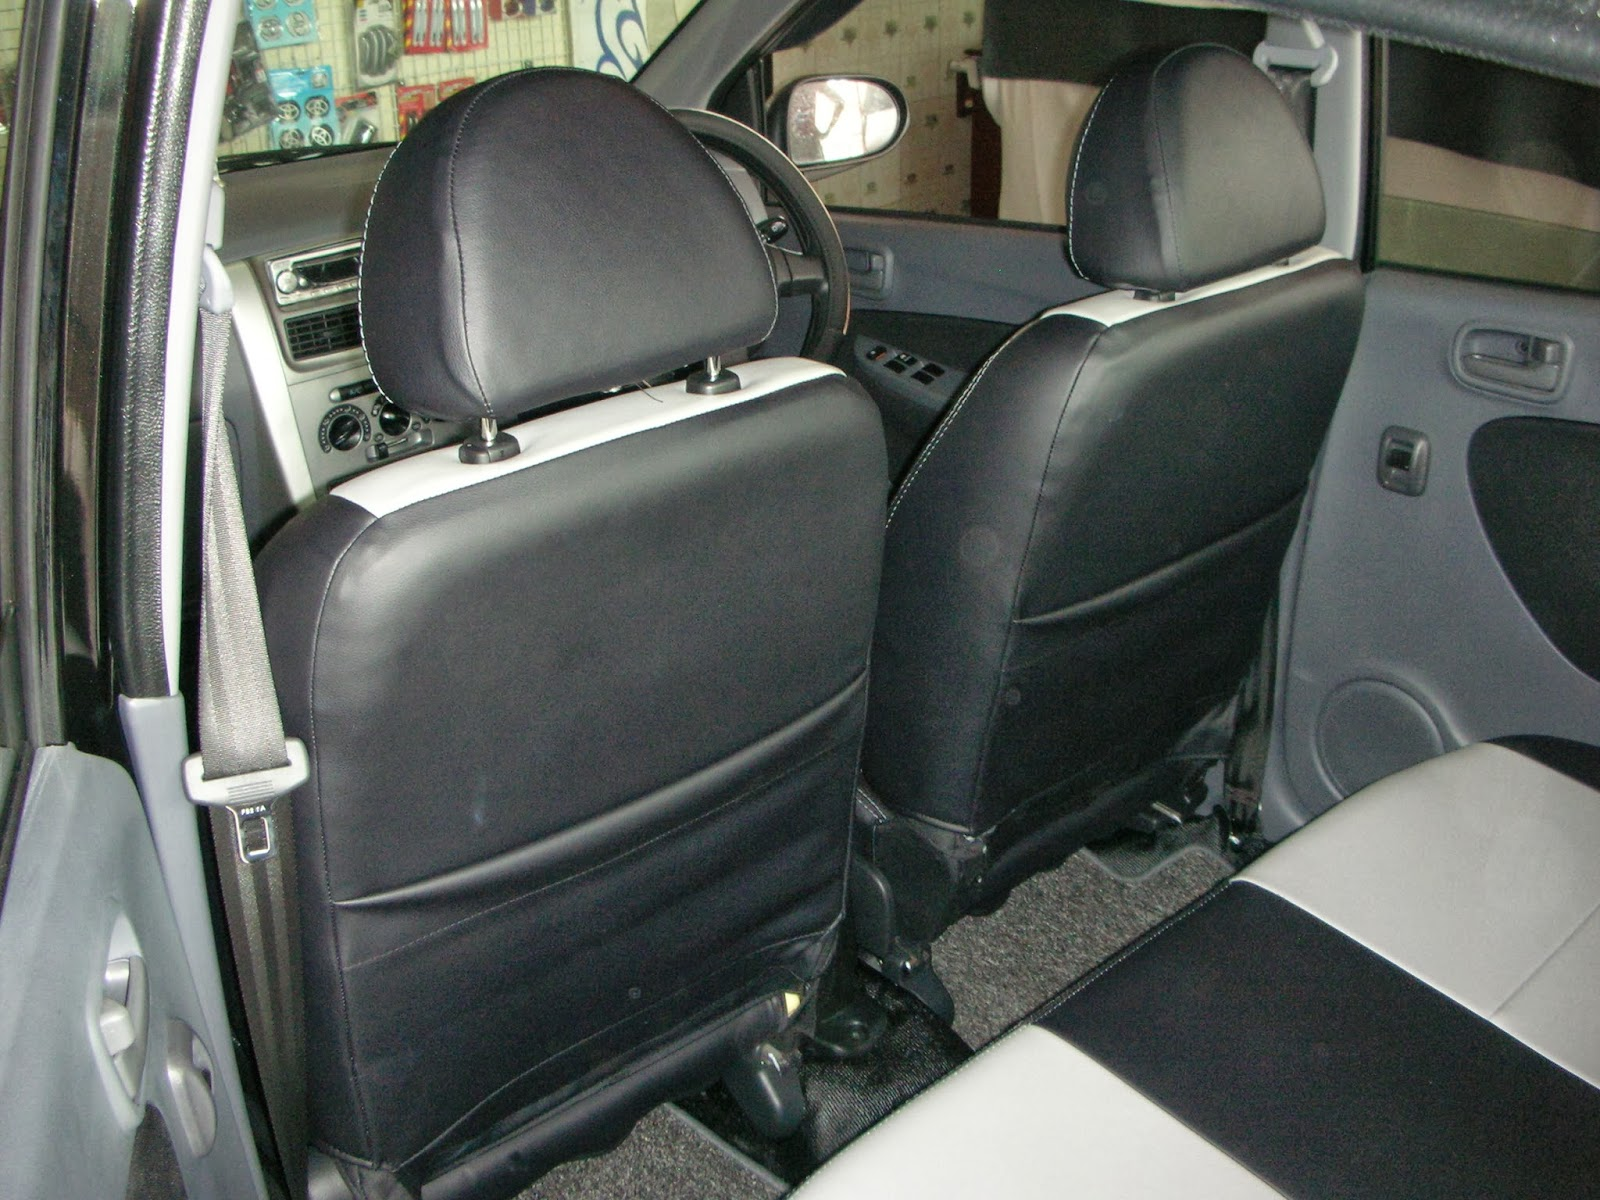 Viva car sticker design - Viva Elite Leather Seat Covers Two Tone Design Vip Car Interiors Srilanka